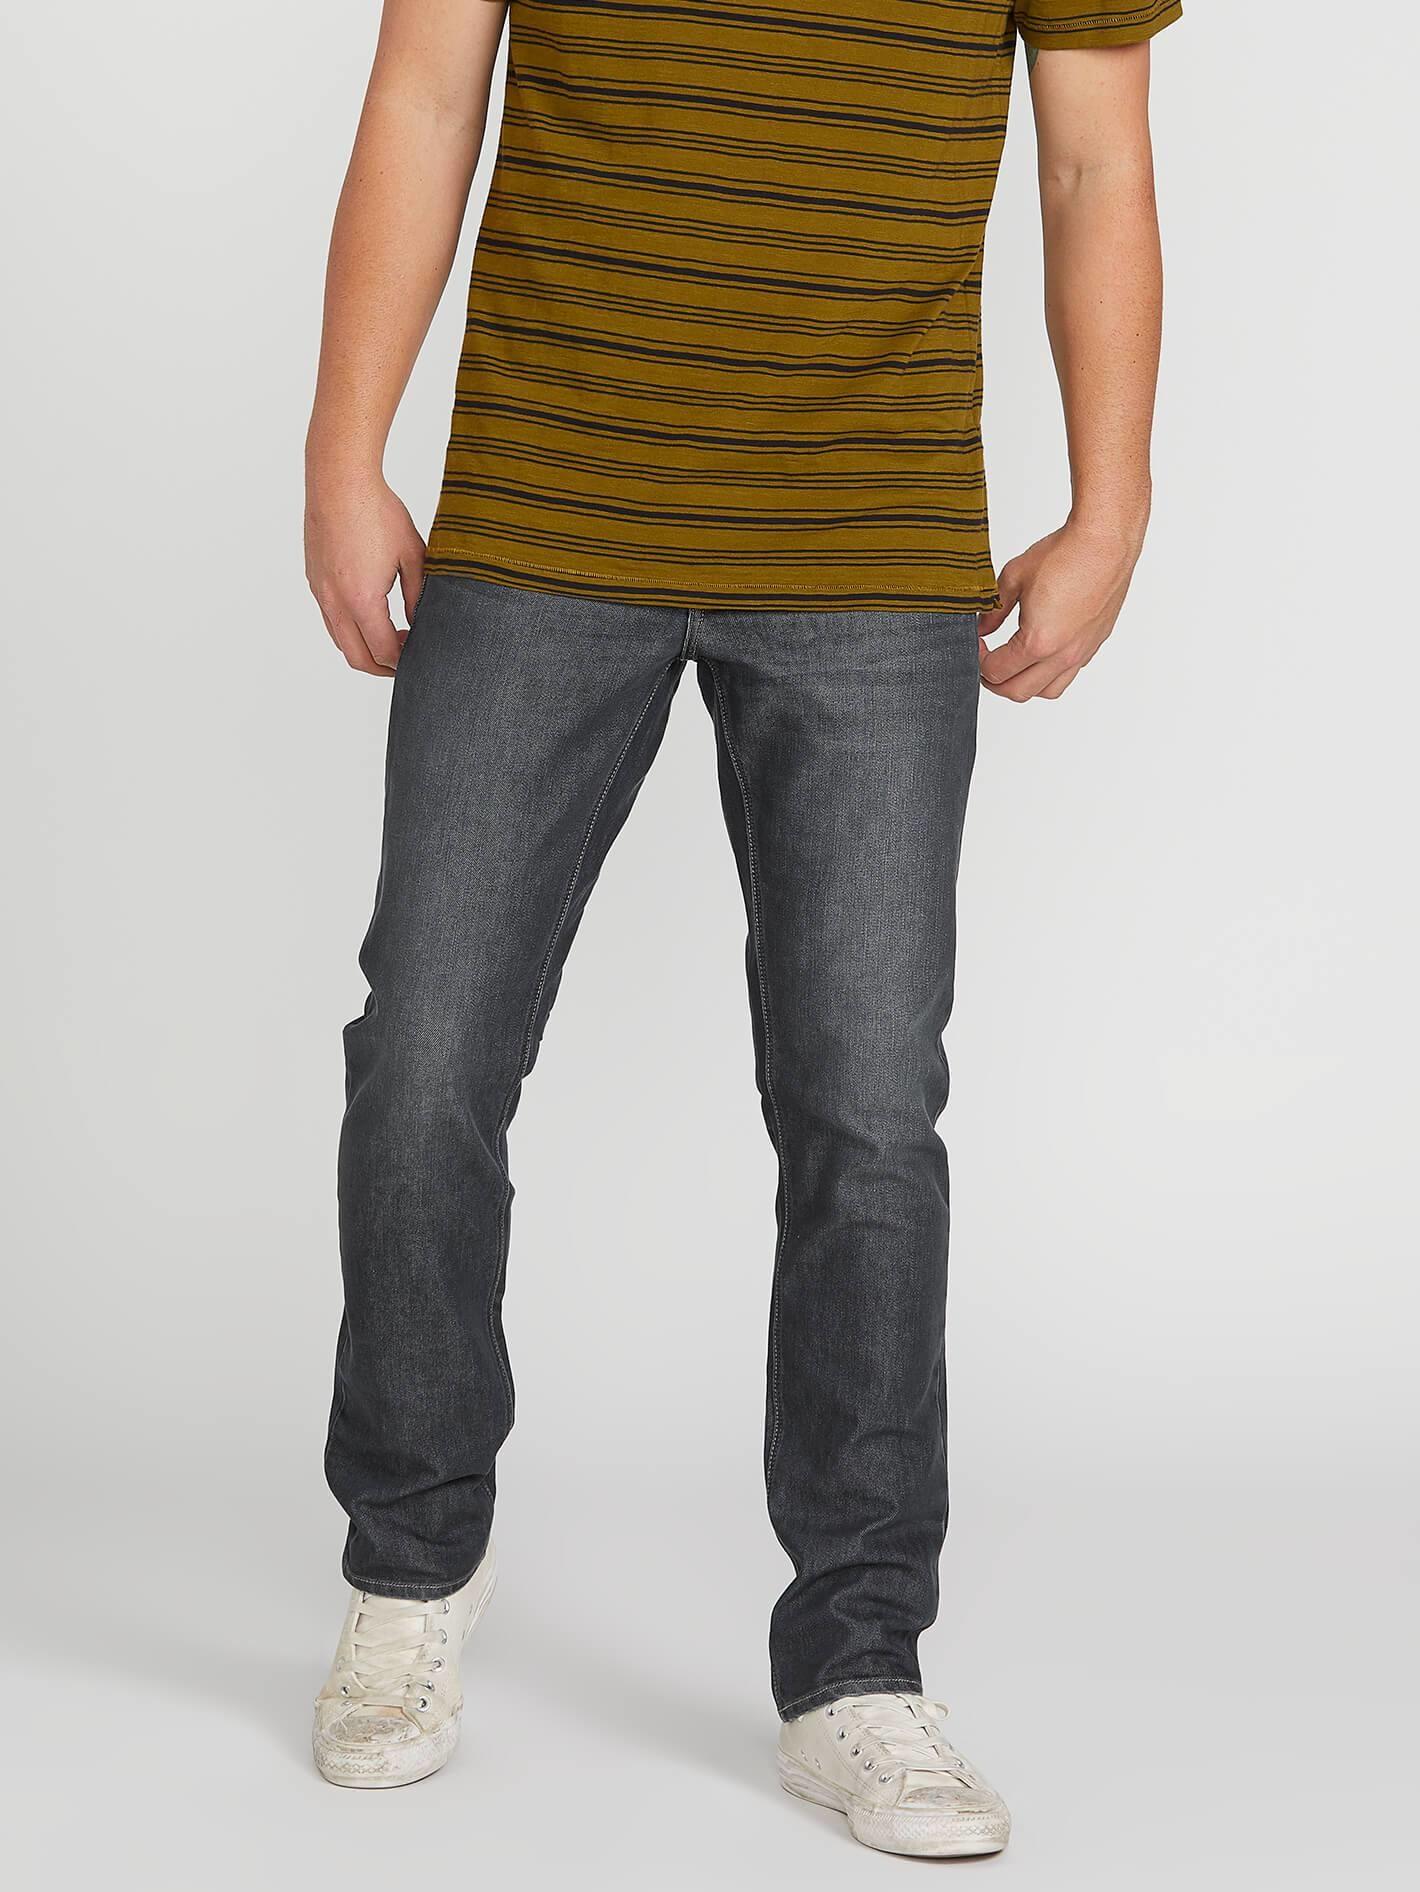 Volcom Vorta Slim Fit Jeans - Bullet Grey Wash Size 32x32